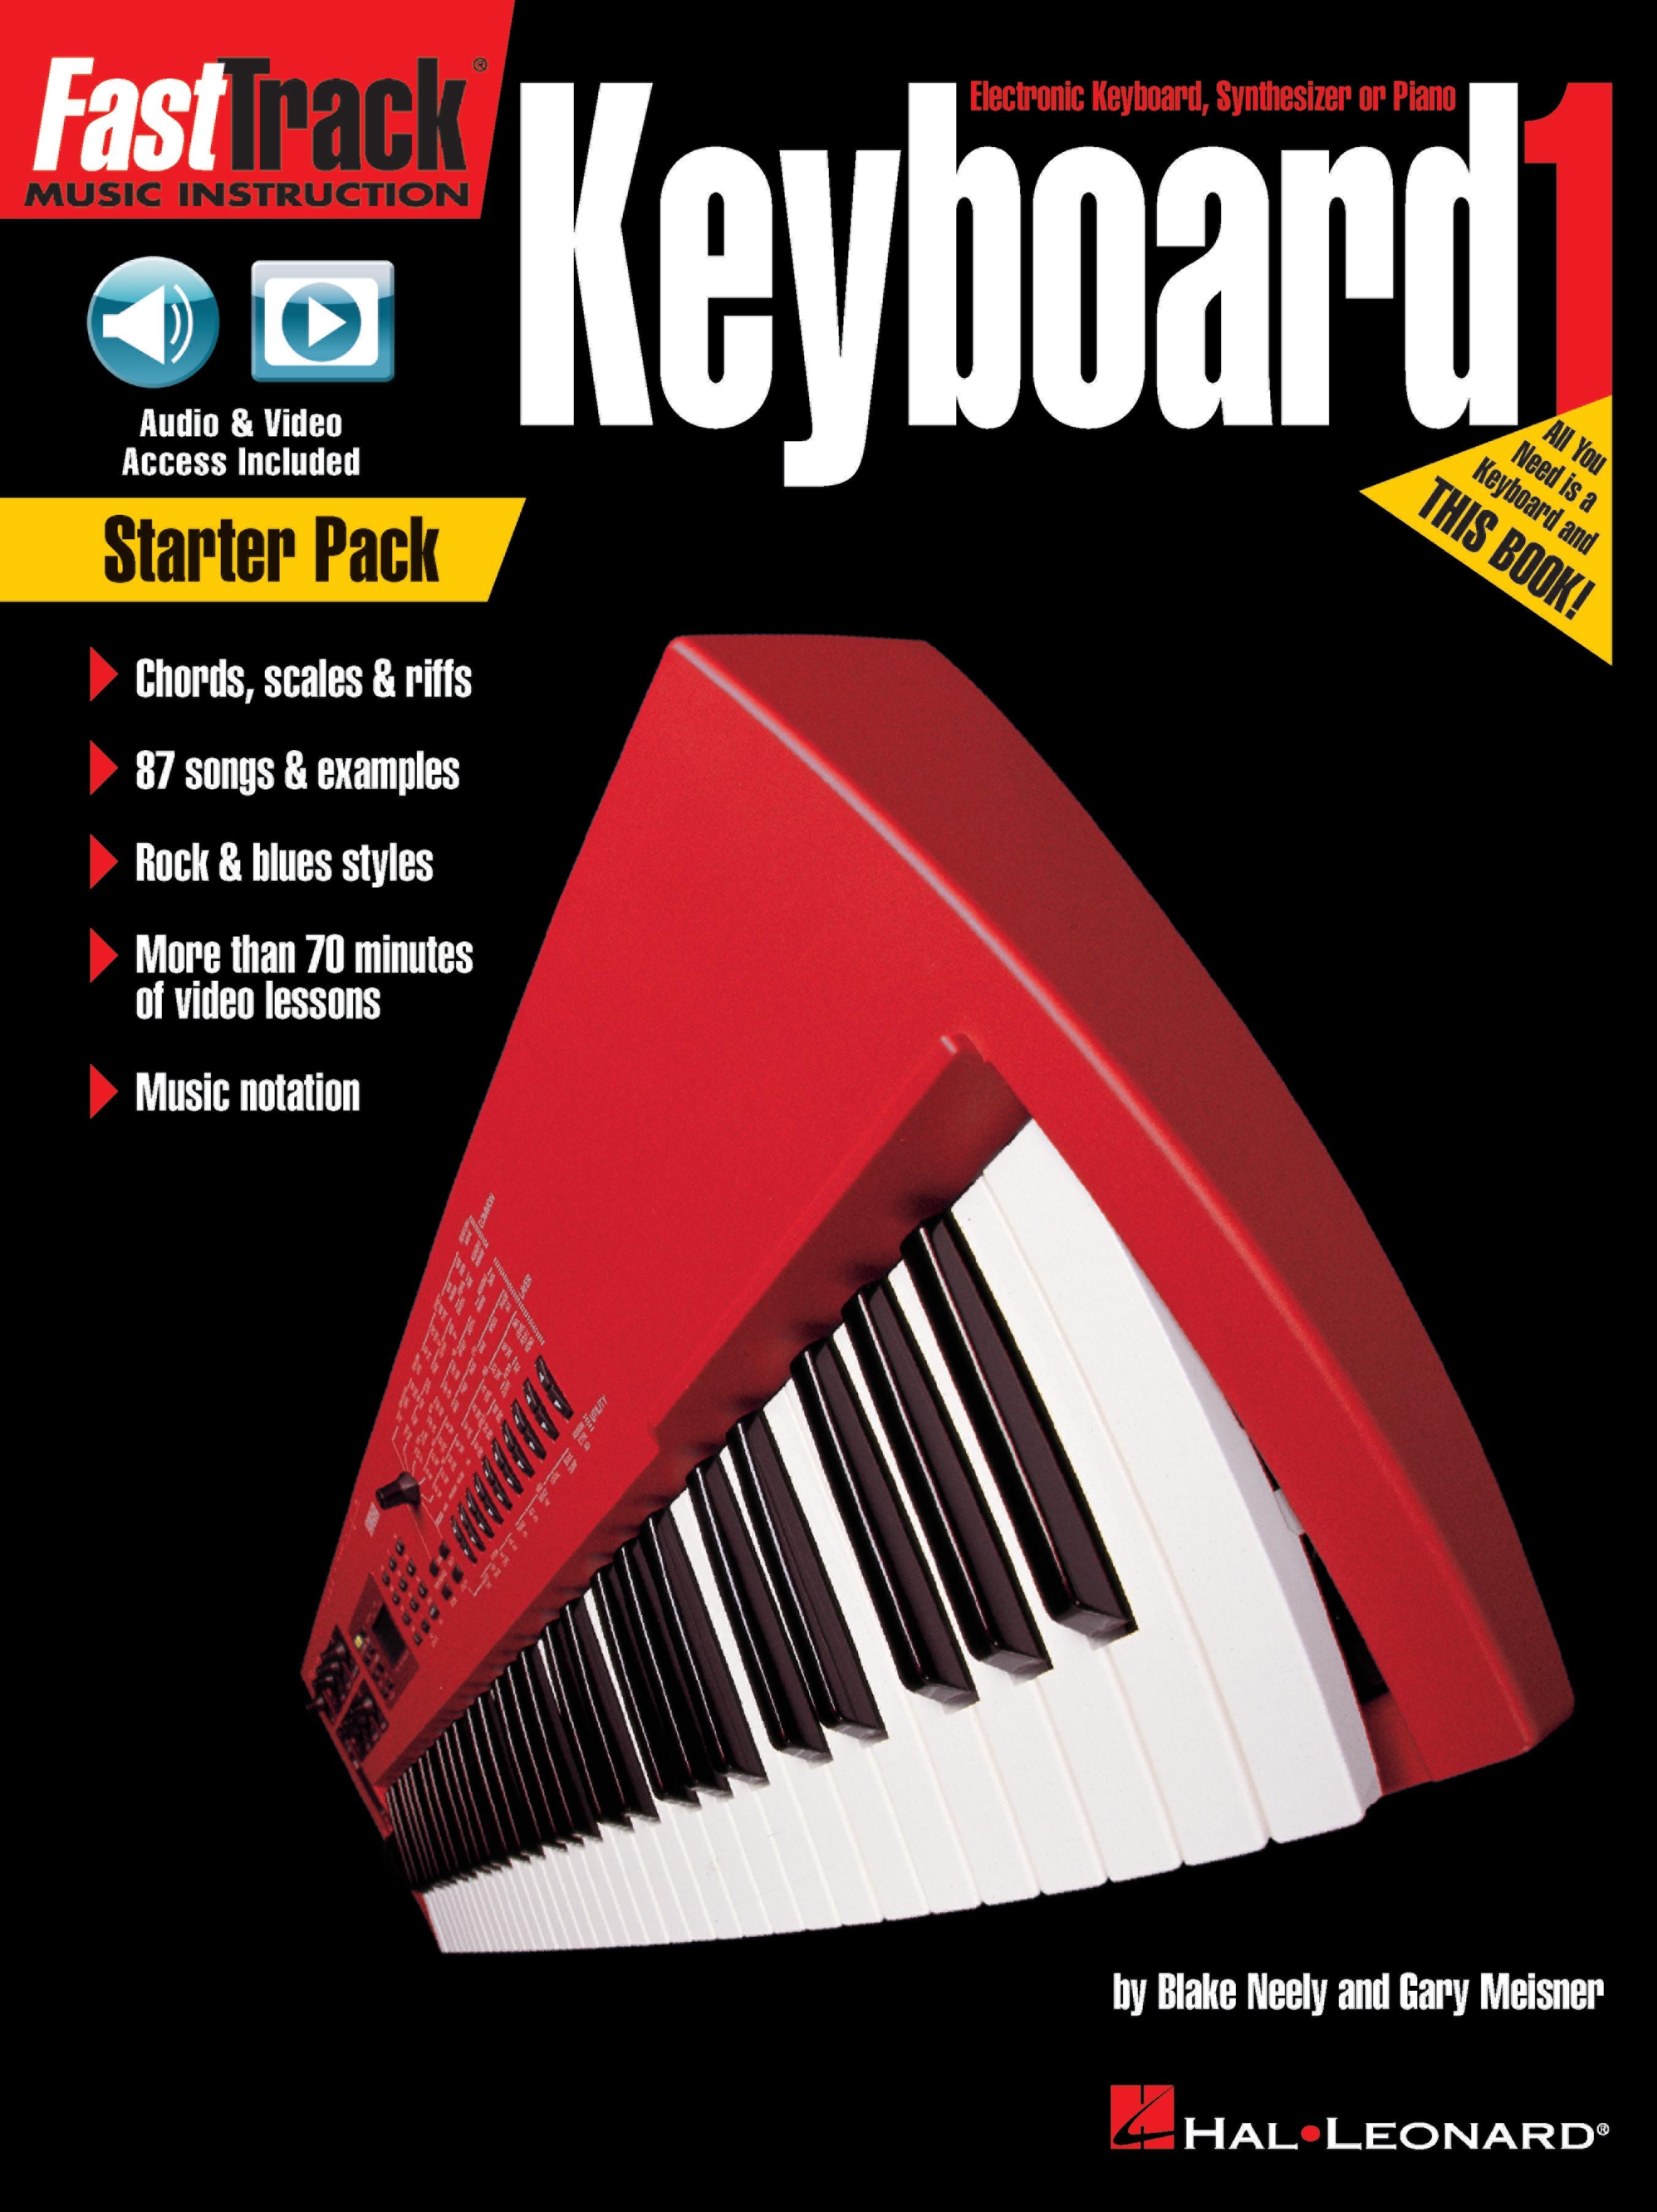 Fast Track Music Instruction Keyboard Vol. 1